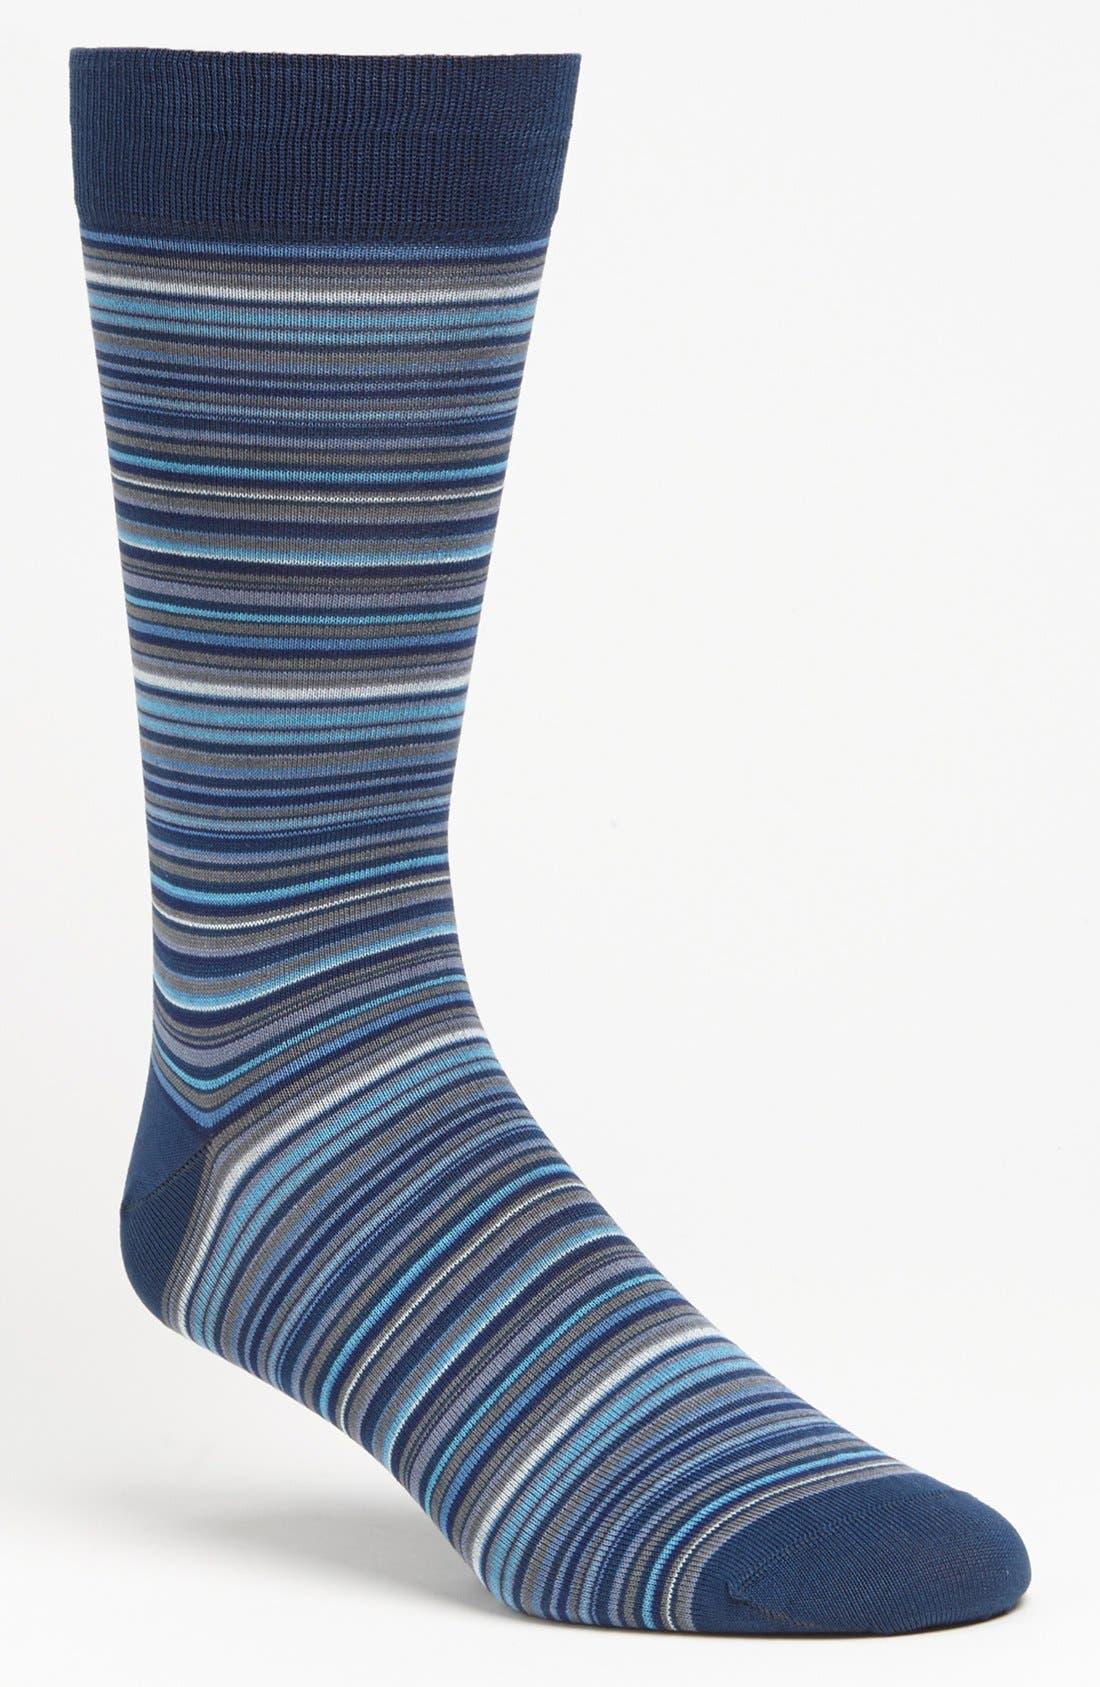 Main Image - Marcoliani 'Mirage' Stripe Socks